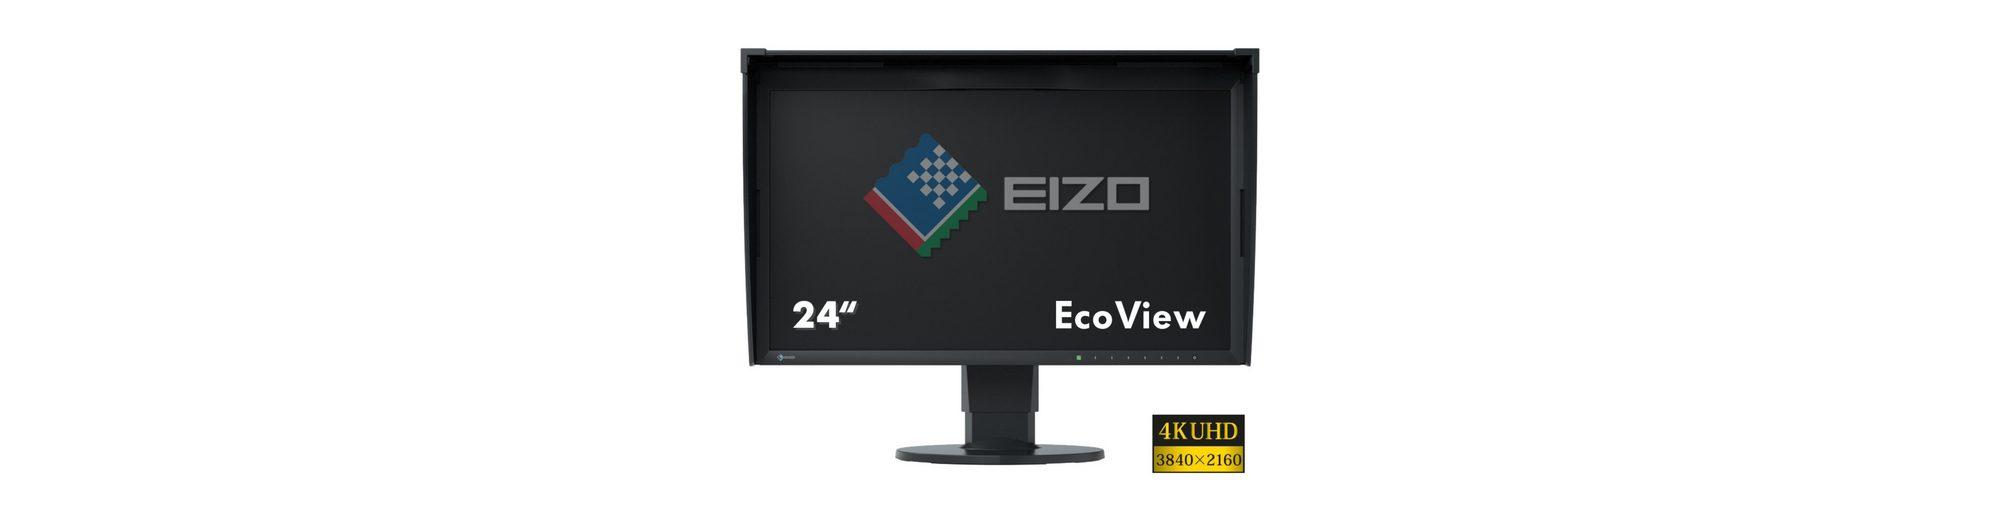 Eizo LED-Monitor »ColorEdge CG248-4K«